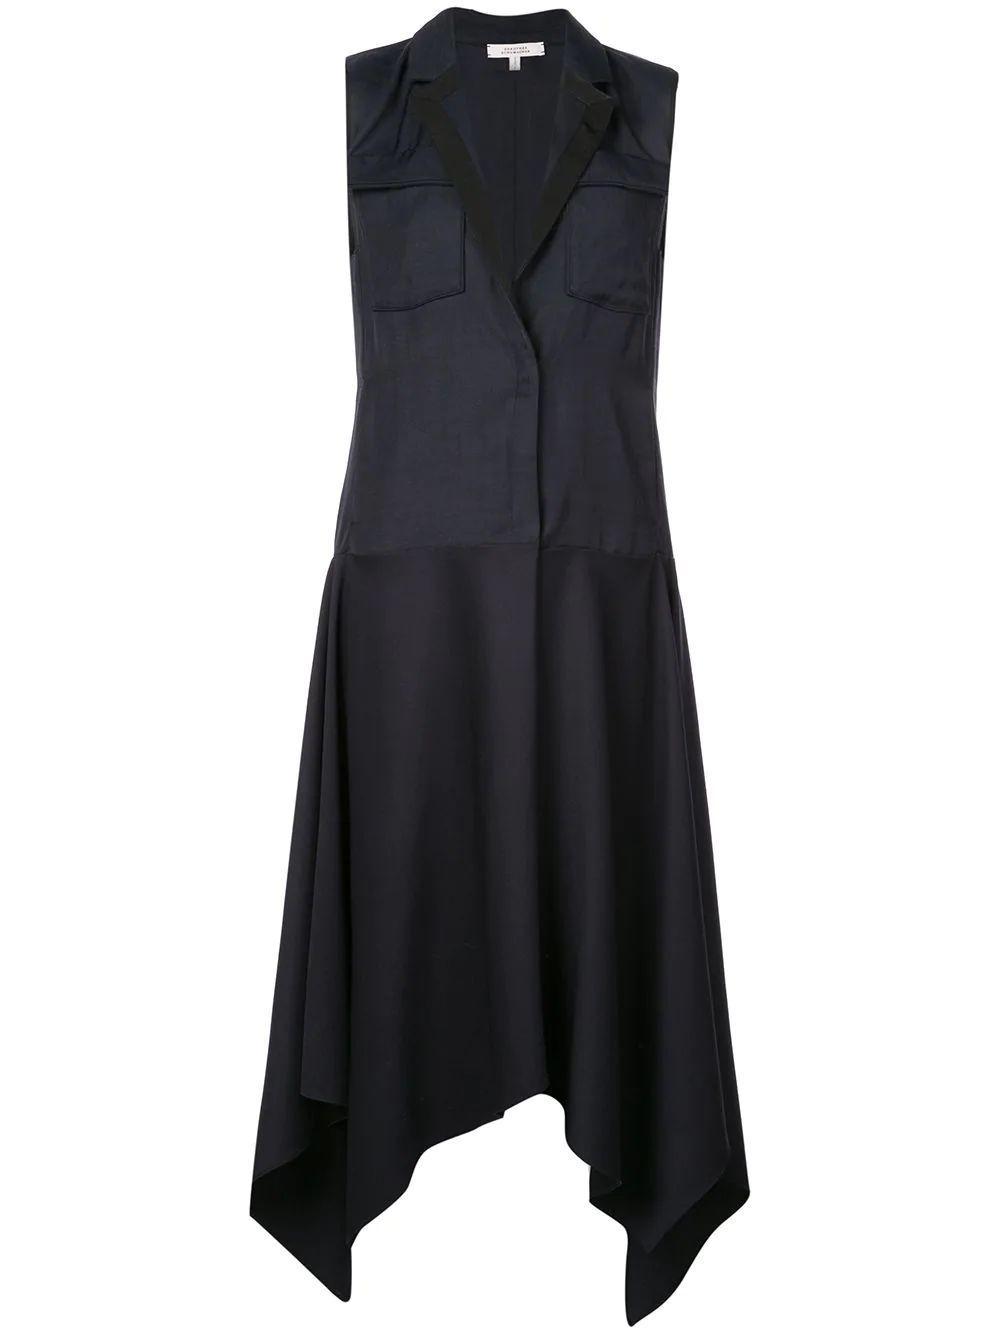 Midsummer Tailoring Sleeveless Coat Item # 191-342301